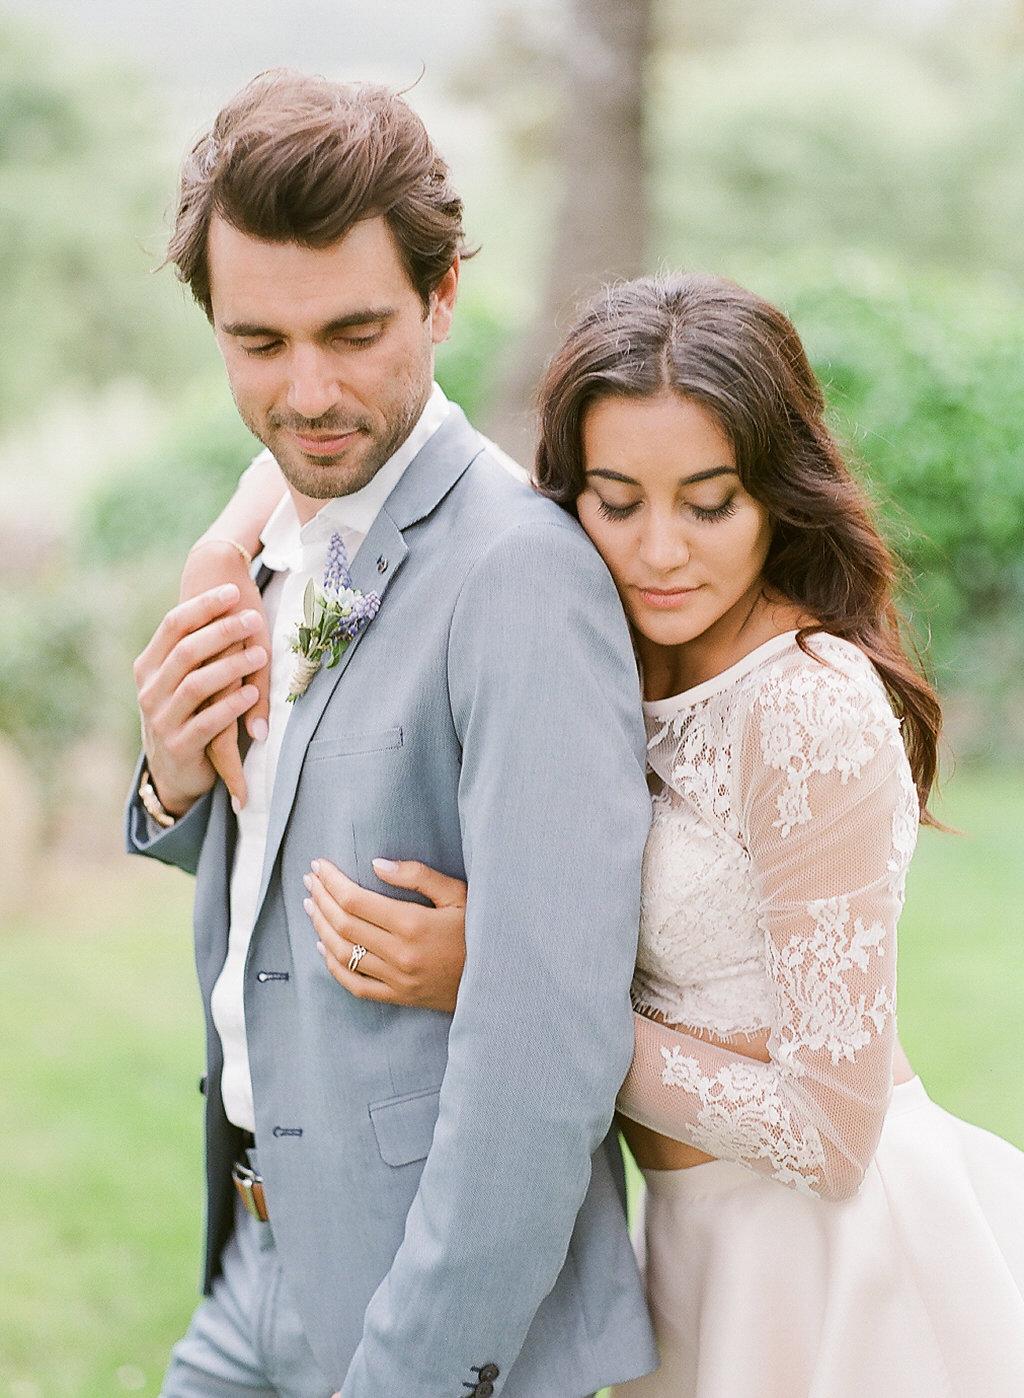 le coeur dans les etoiles - wedding planner - provence - luberon - alpilles - drome - vaucluse - sardaigne - italie - organisation - mariage - shooting - dolce vita - valery villard-402